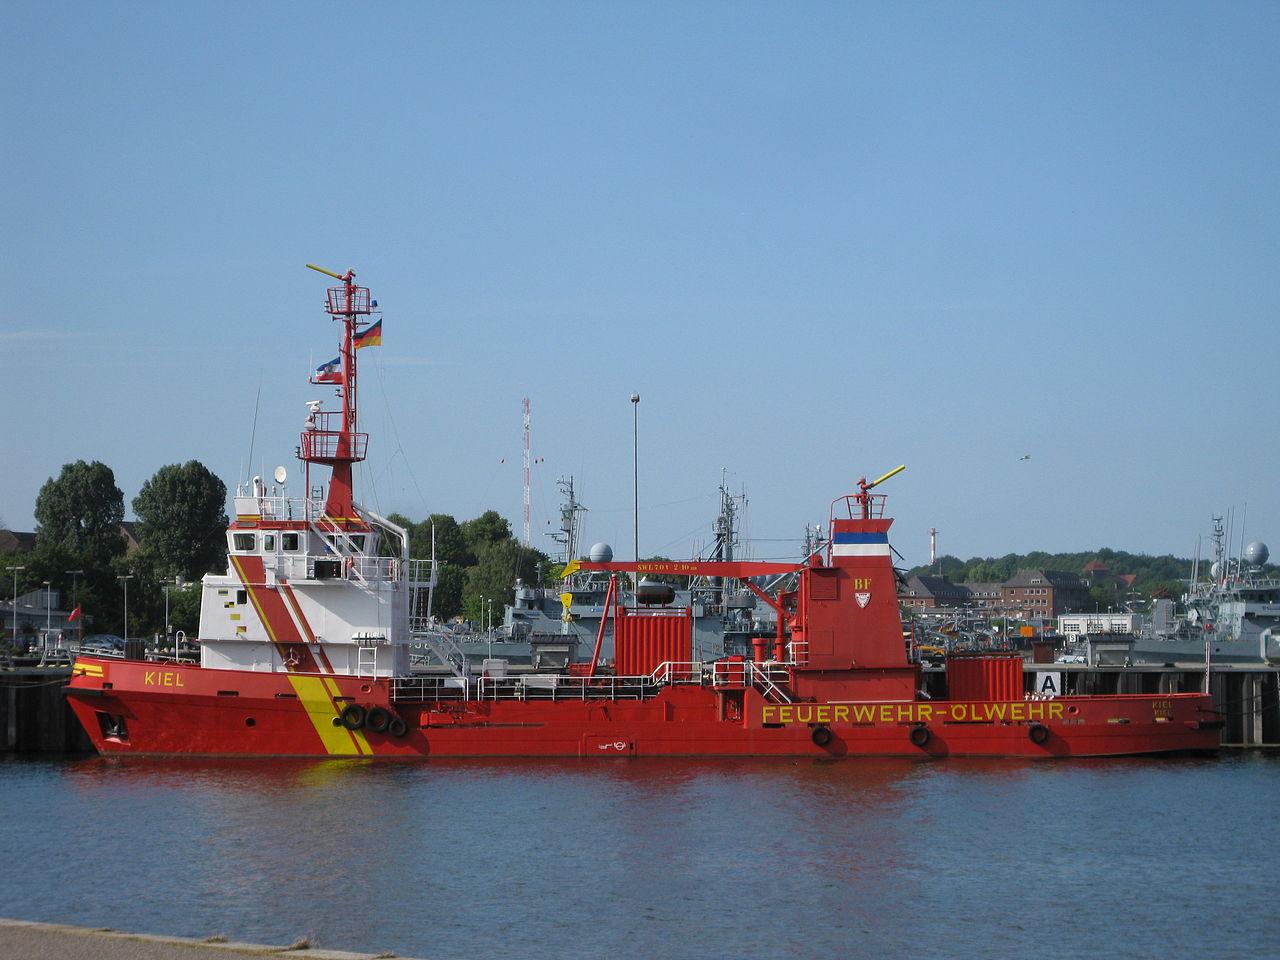 Bild Feuerlöschboot Kiel